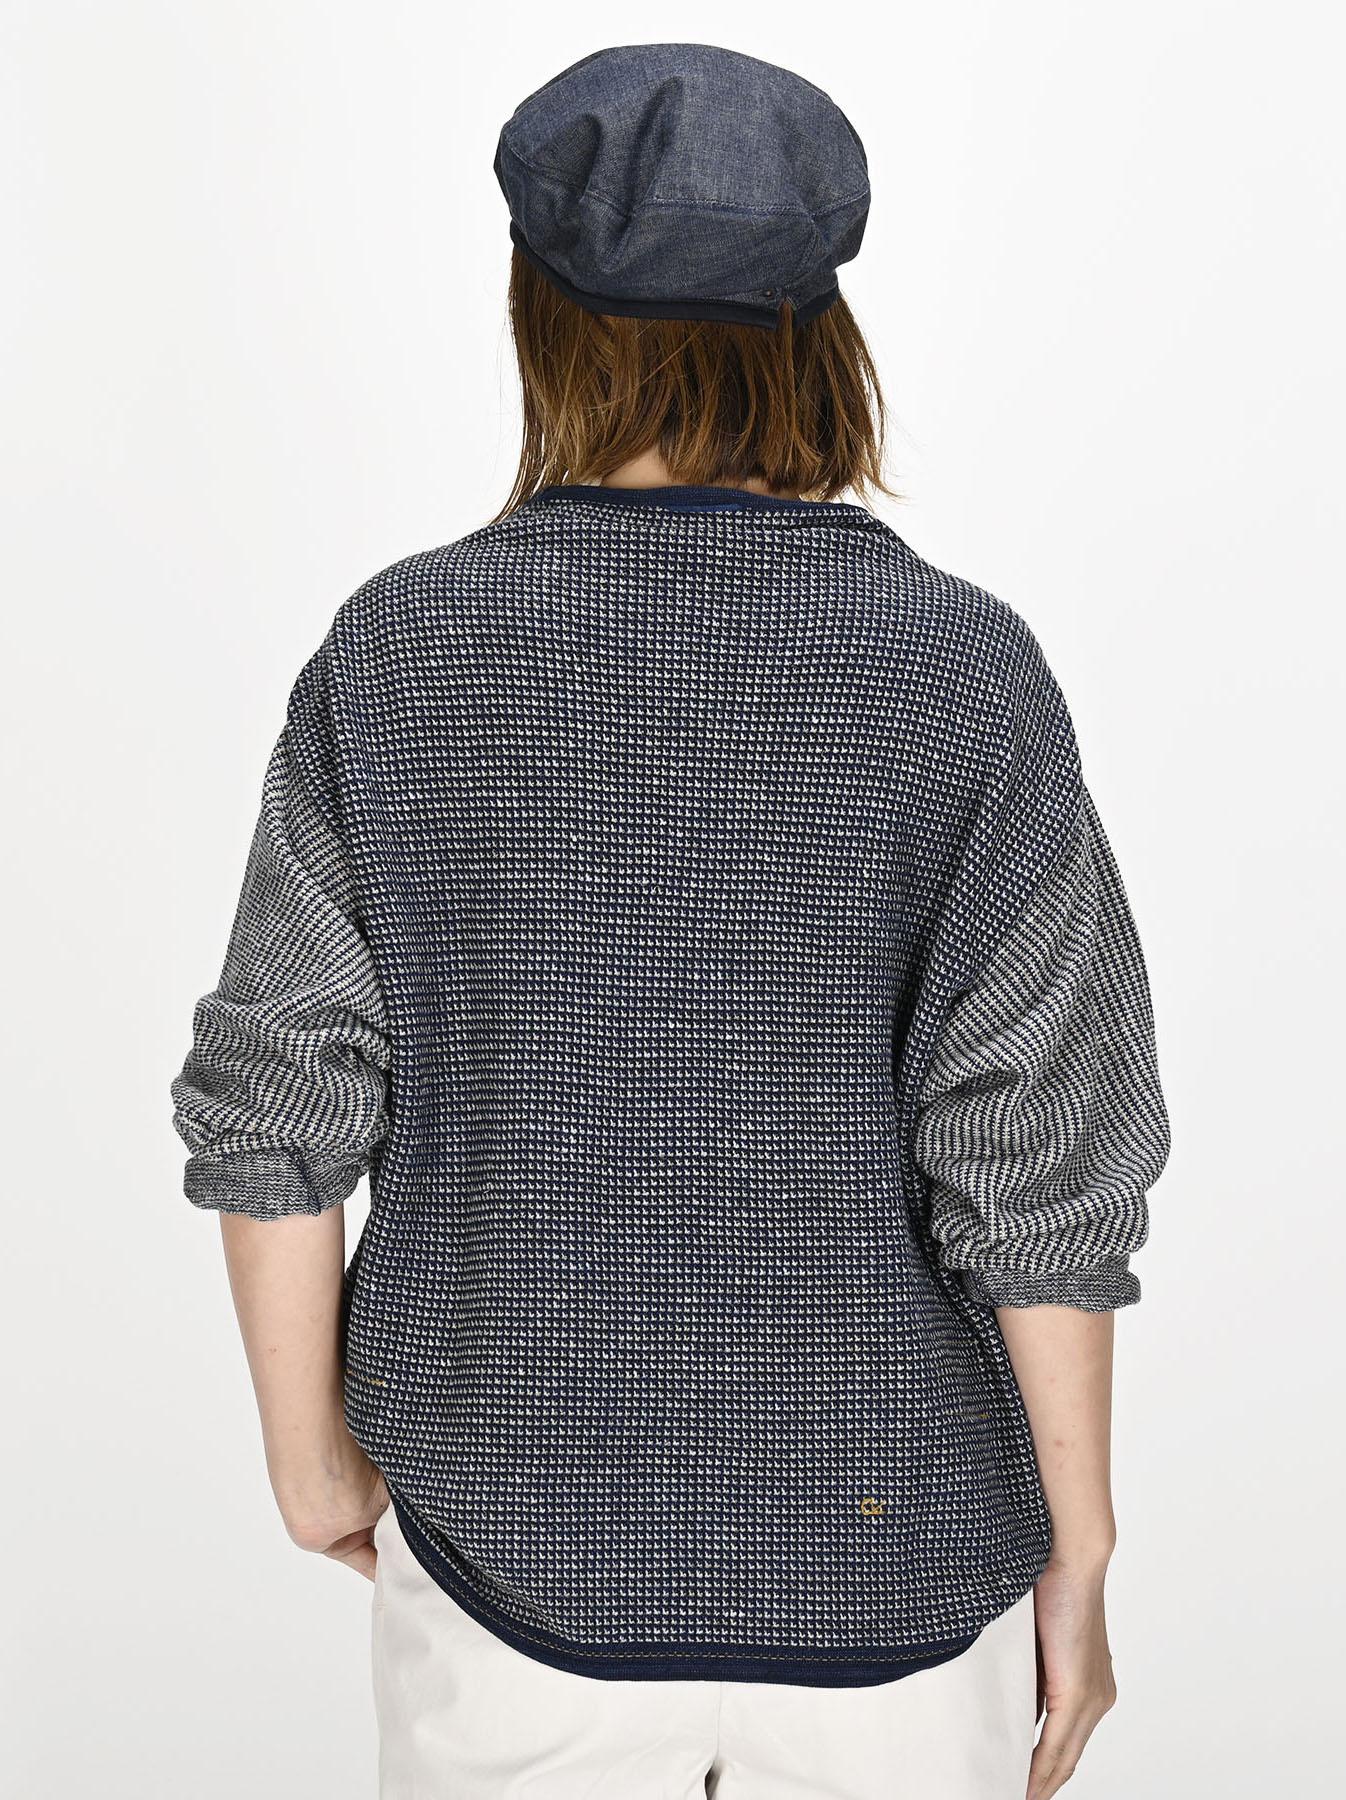 Indigo Tappet Kanoko Umahiko Sweater-4